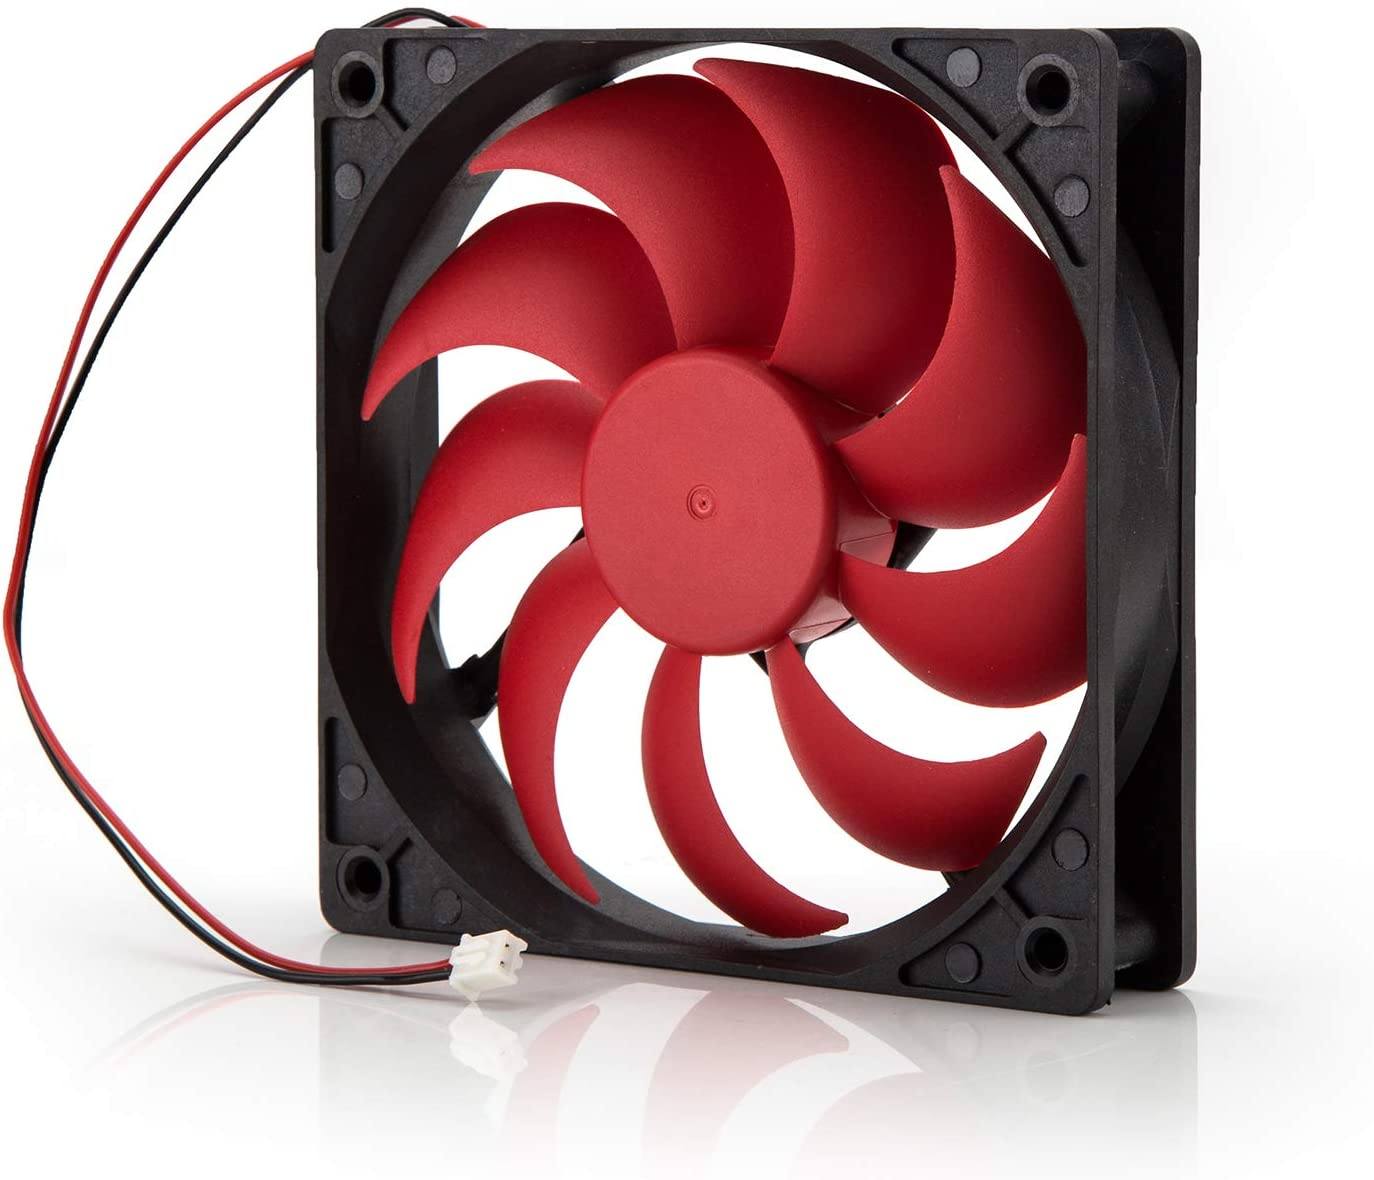 Neuftech® 120x120mm Ventilador de CPU Cooling Cooler Fan para Caja de PC Ordenador 12V,Negro y Rojo